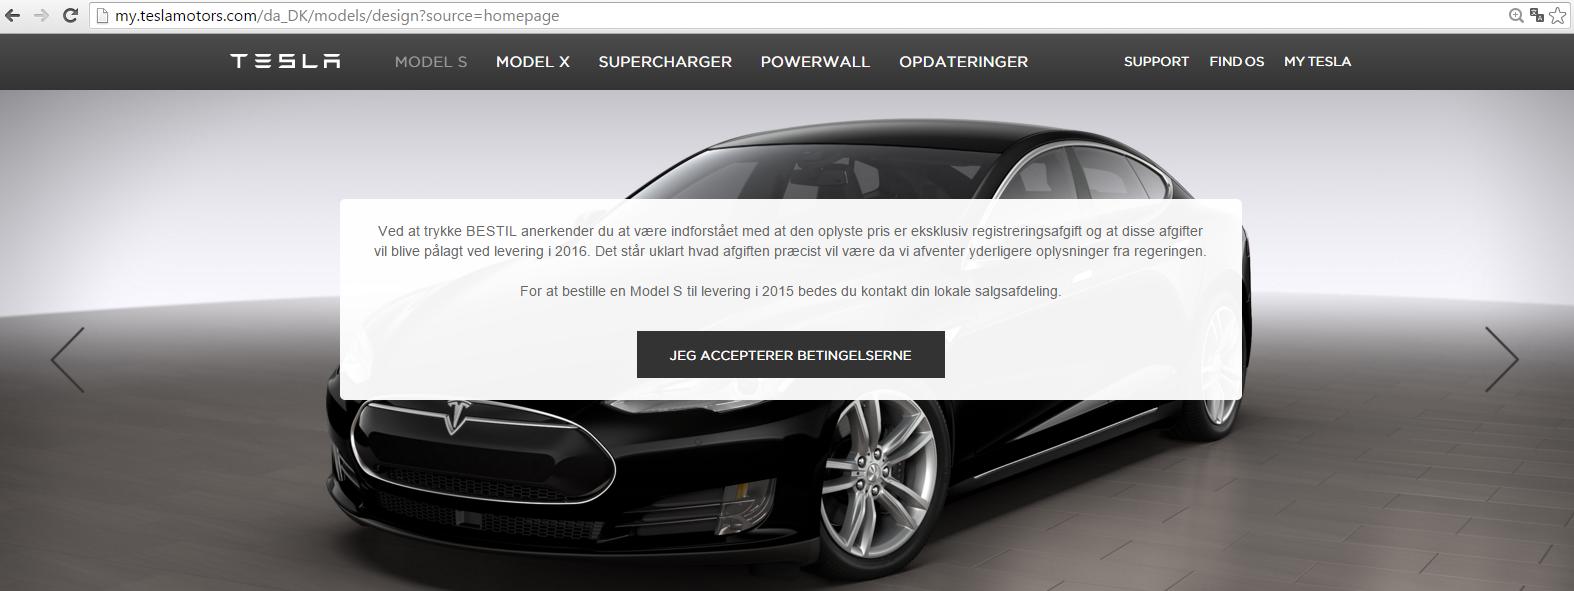 Tesla: More On The 2,500 Danish License Plates Mystery - Tesla, Inc ...